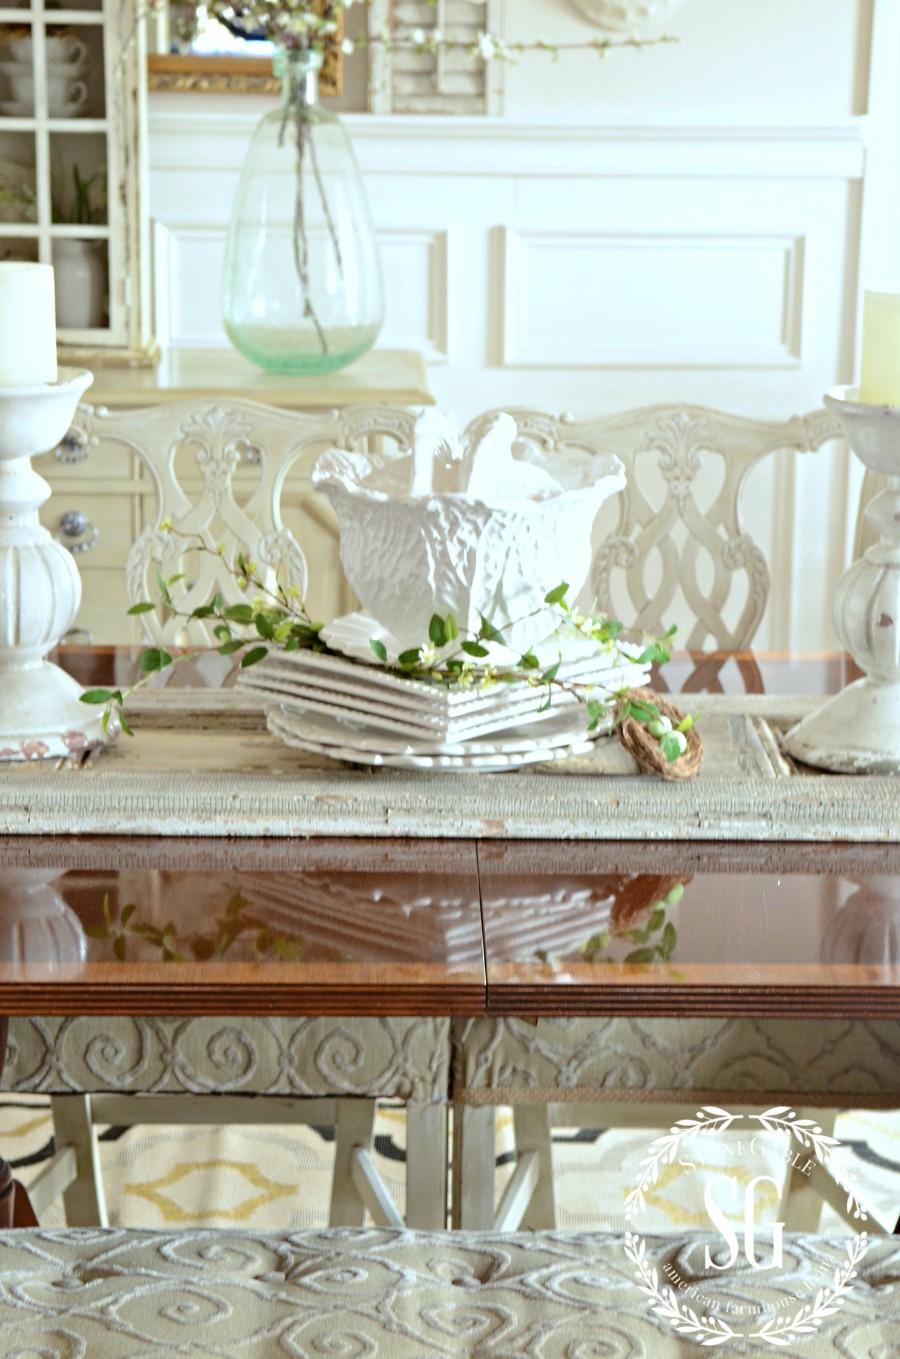 NEW DINING ROOM RUG-dining room centerpiece-stonegableblog.com